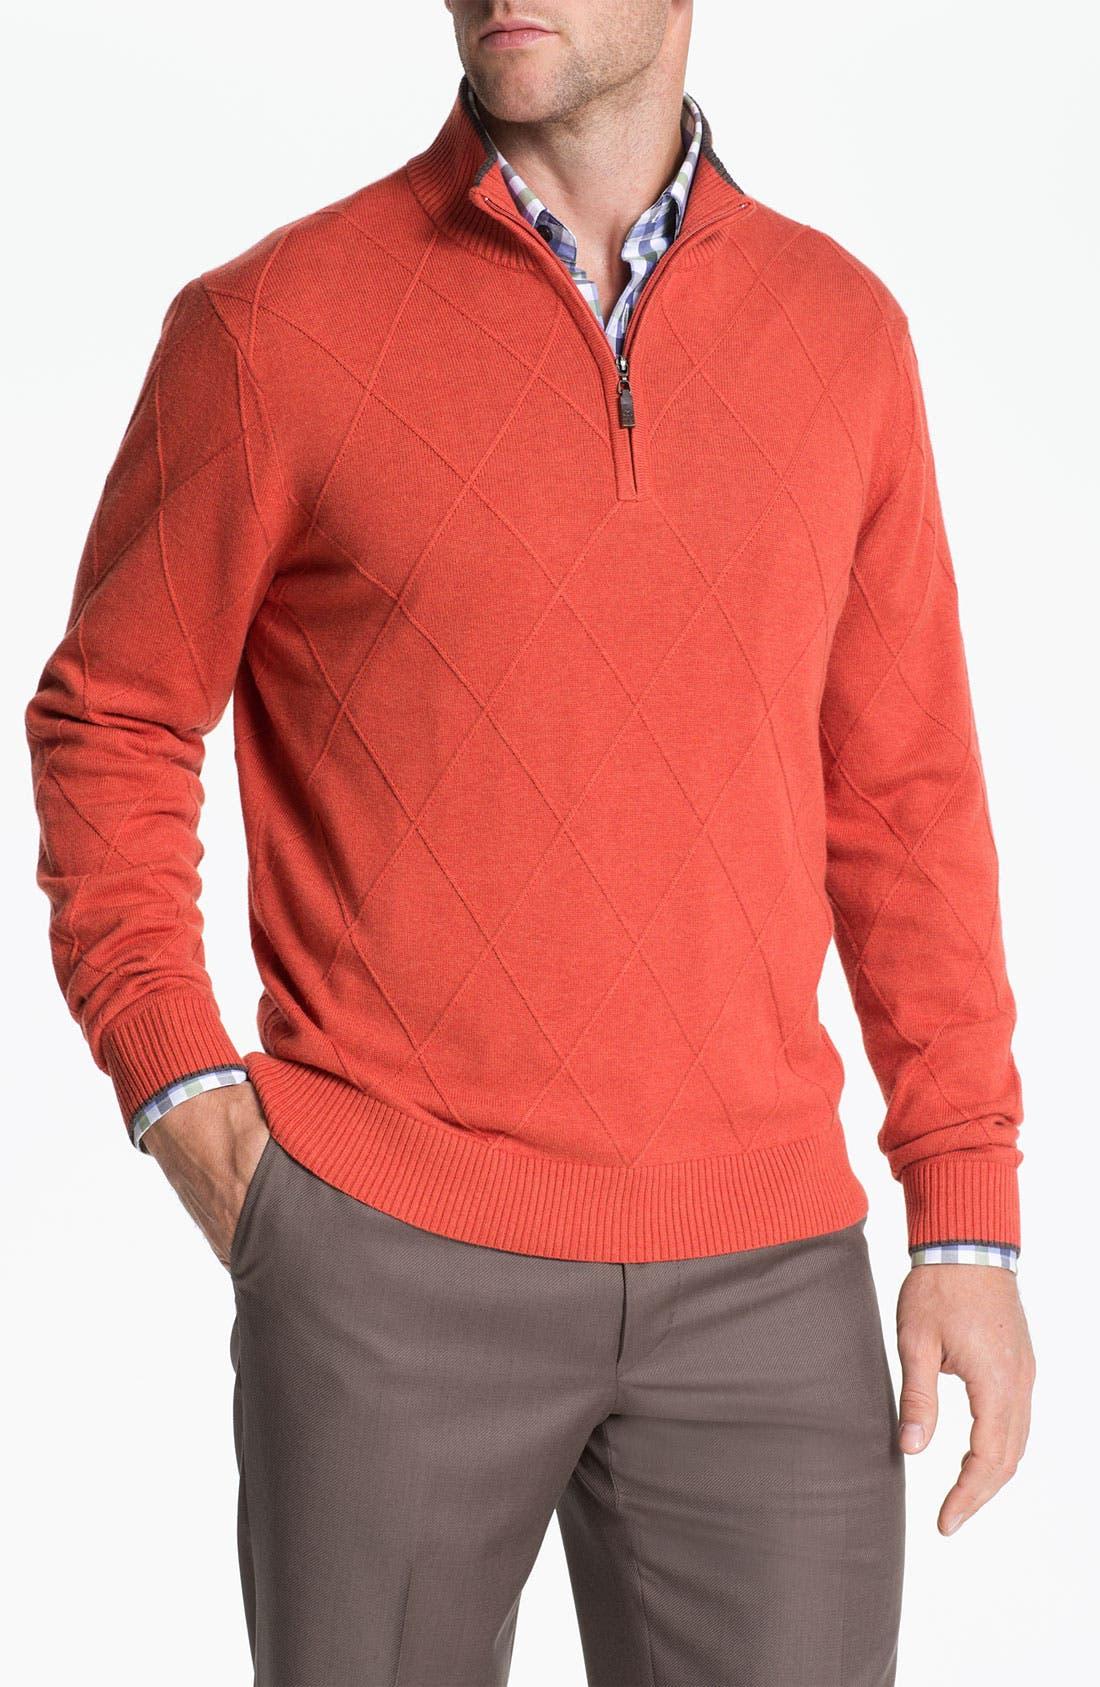 Alternate Image 1 Selected - Robert Talbott Cotton & Cashmere Quarter Zip Sweater